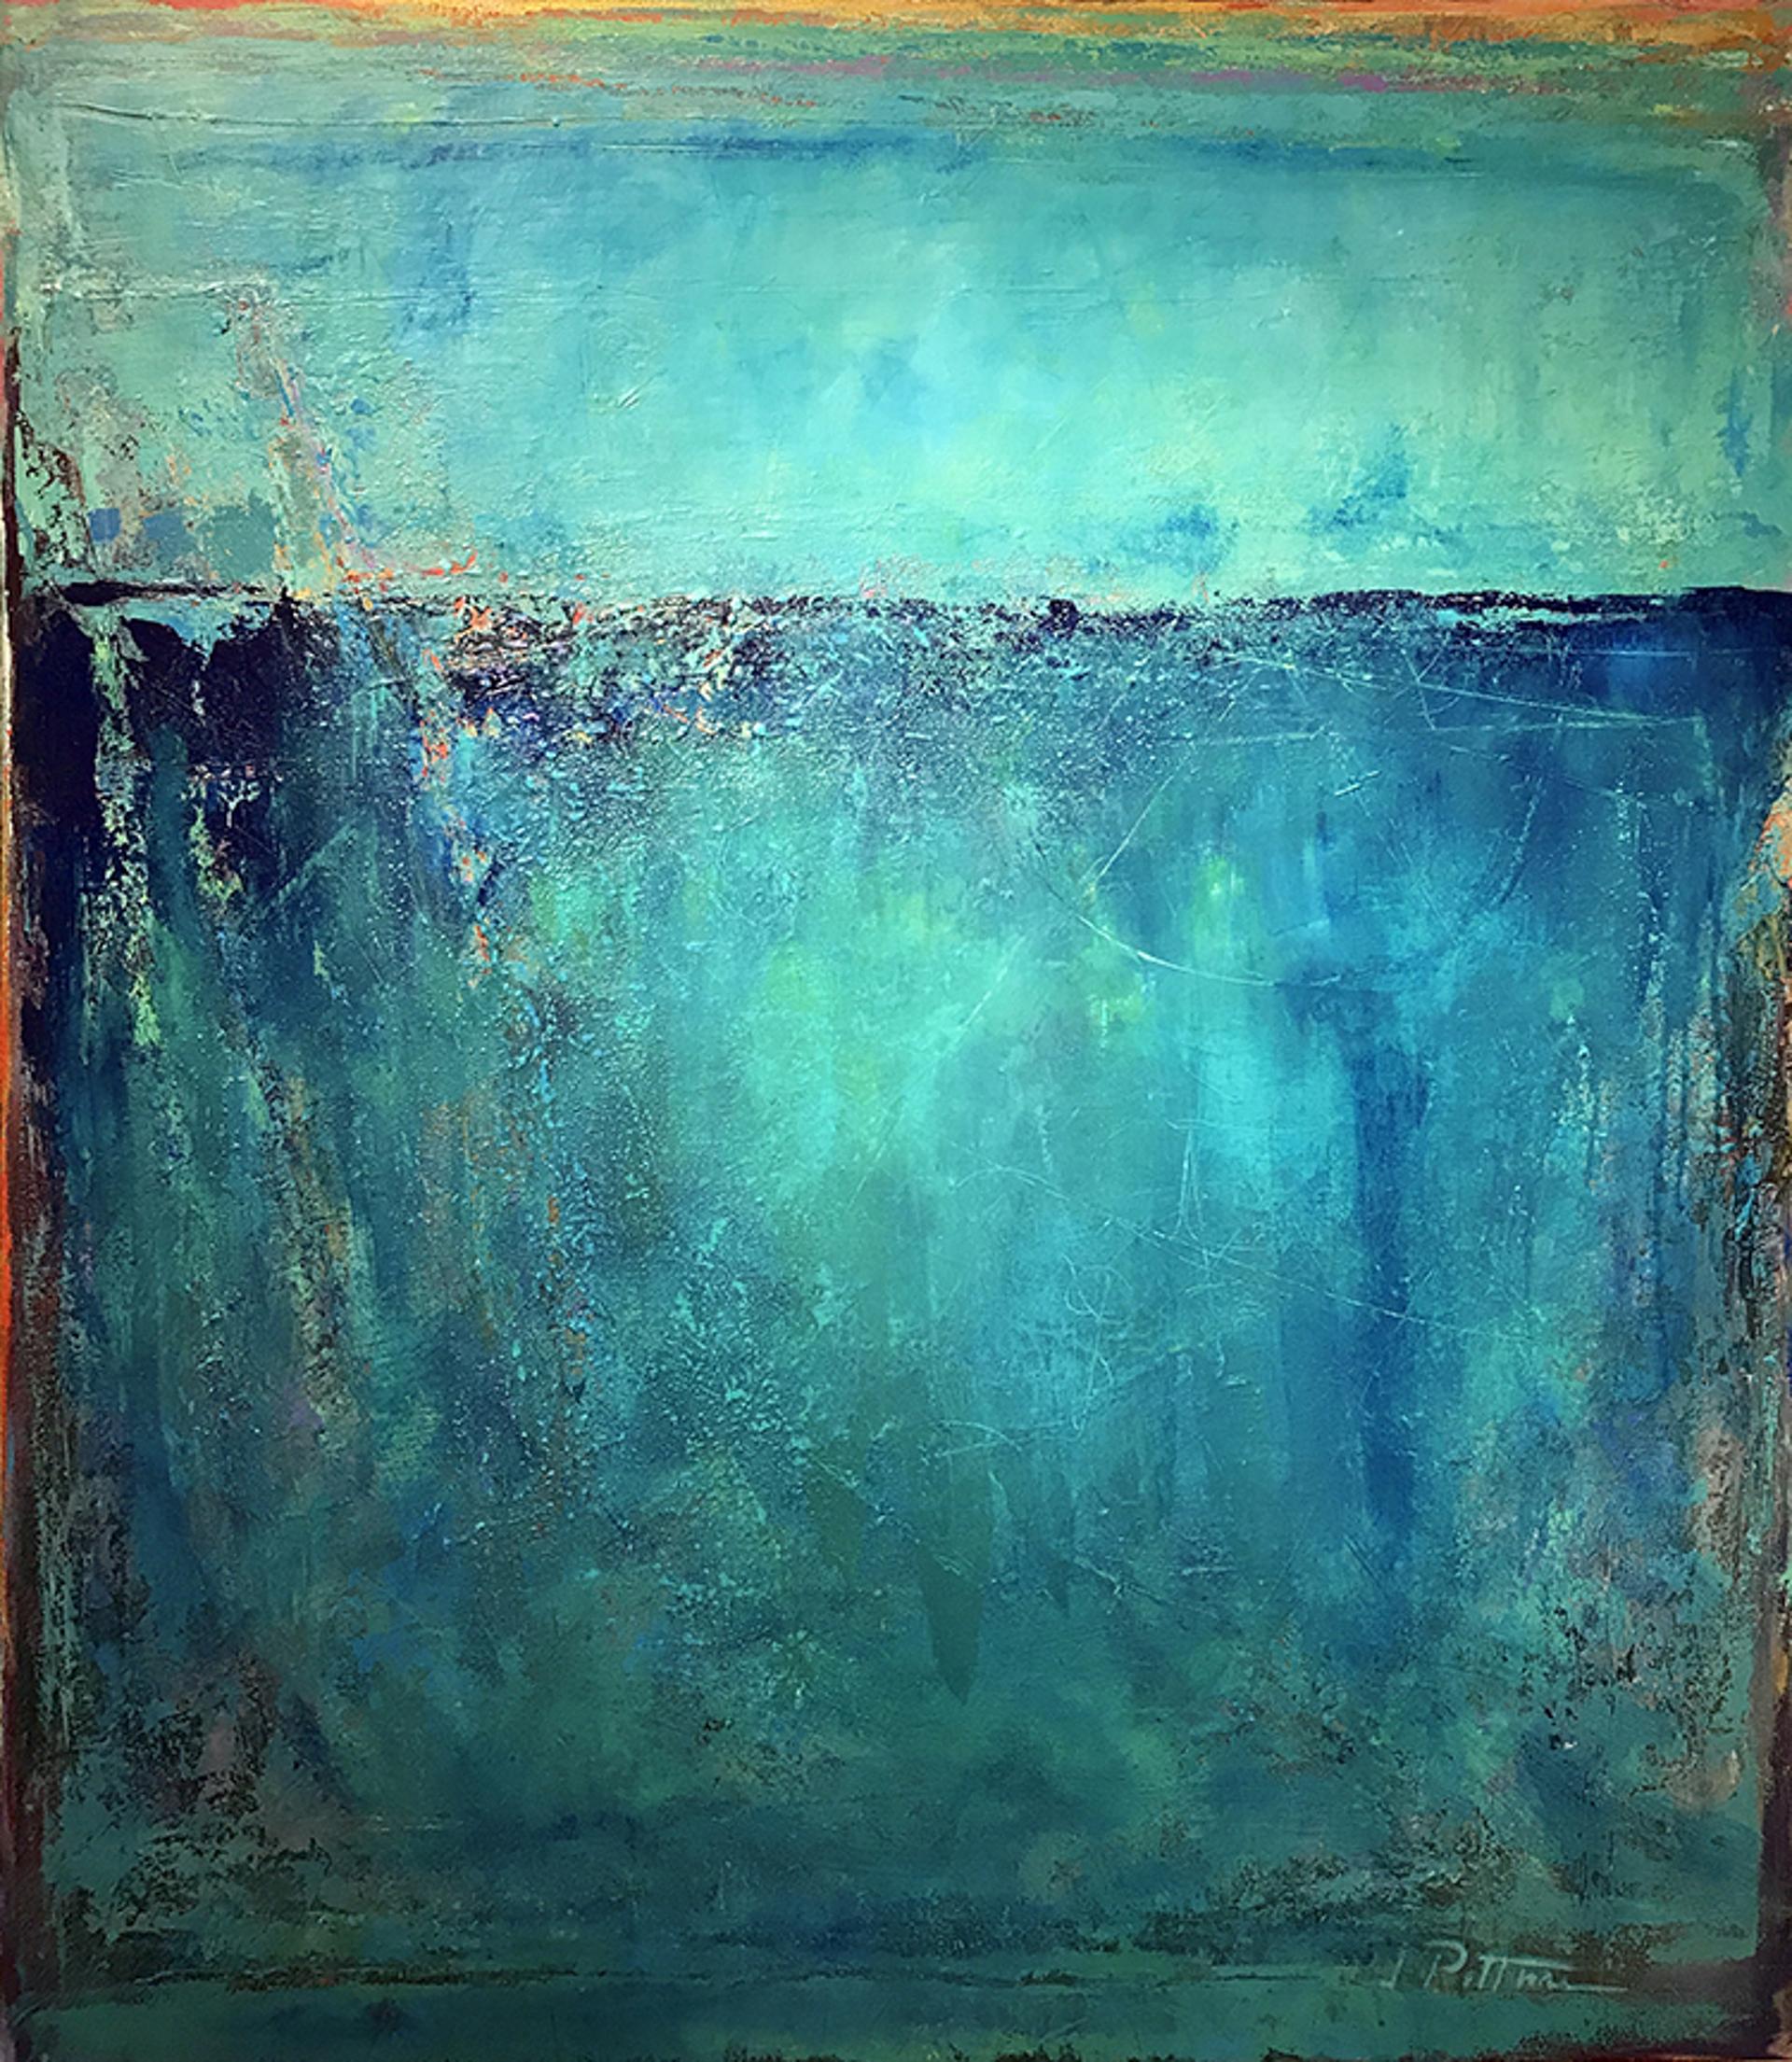 Blue Rain by Jim Pittman